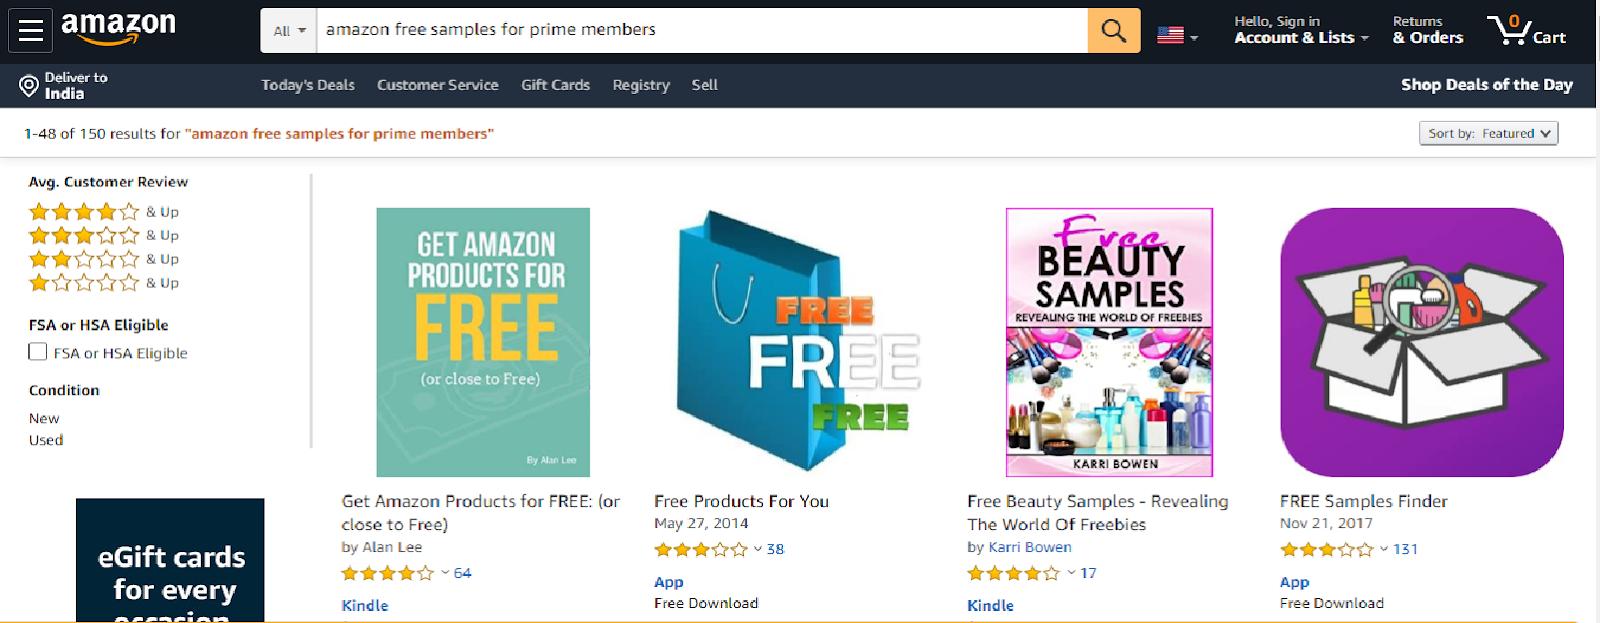 get free stuff from amazone